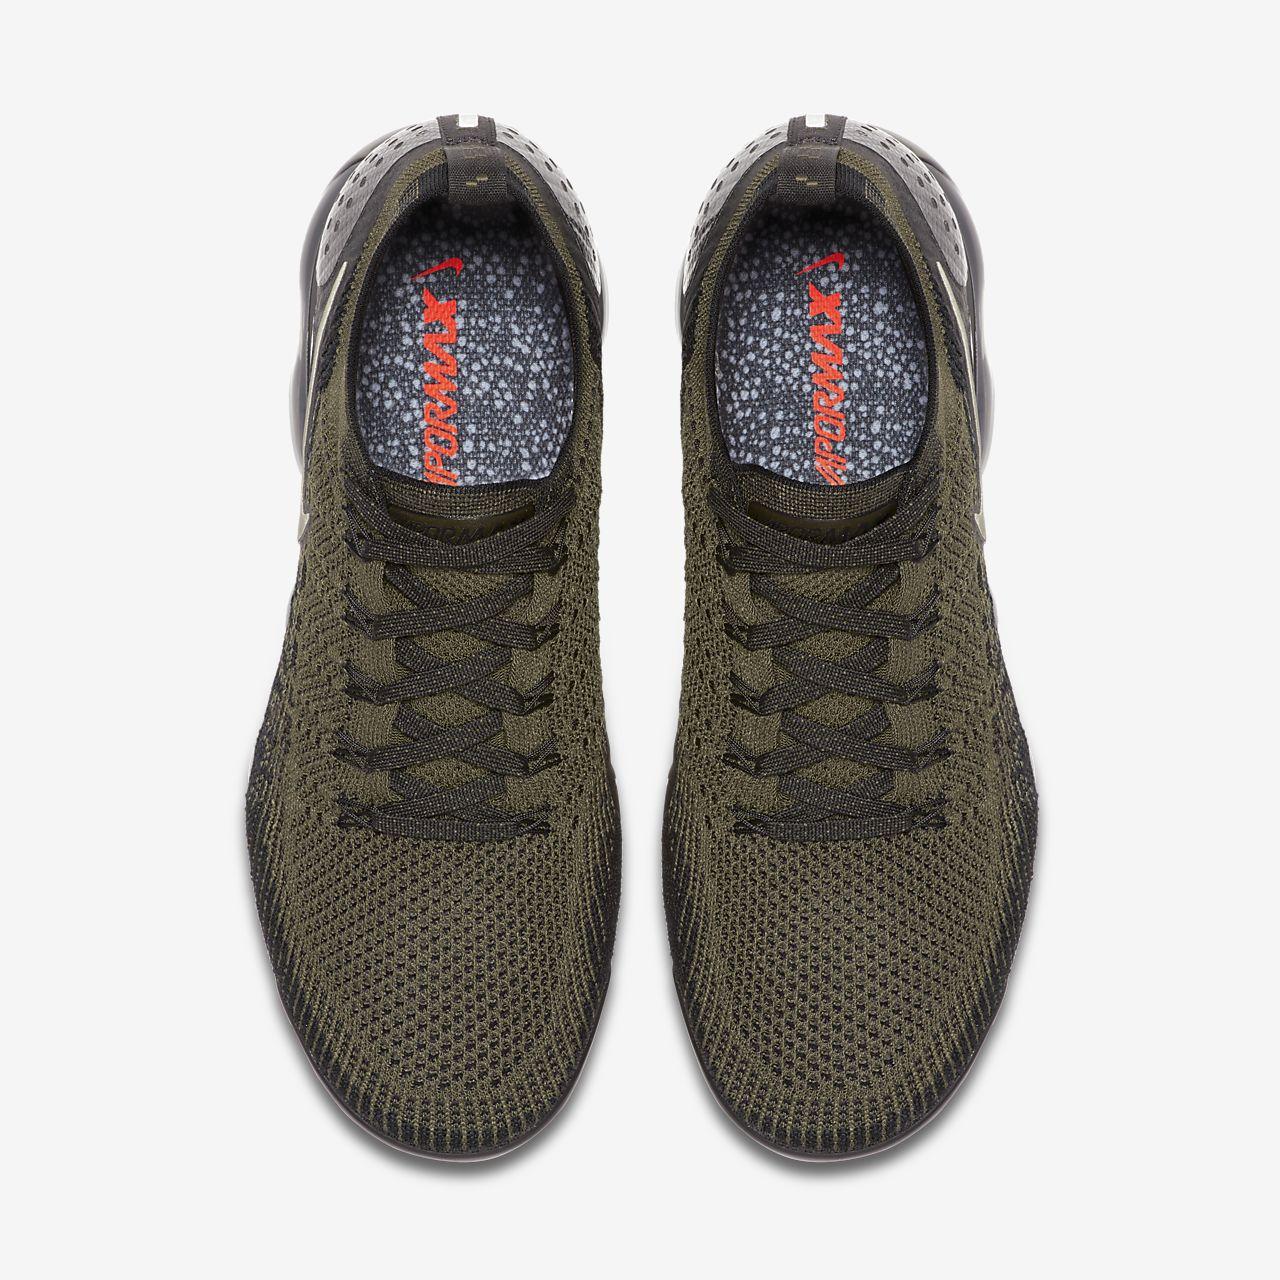 dbb68e573acc77 Nike Air VaporMax Flyknit 2 Snake Men s Shoe. Nike.com NL